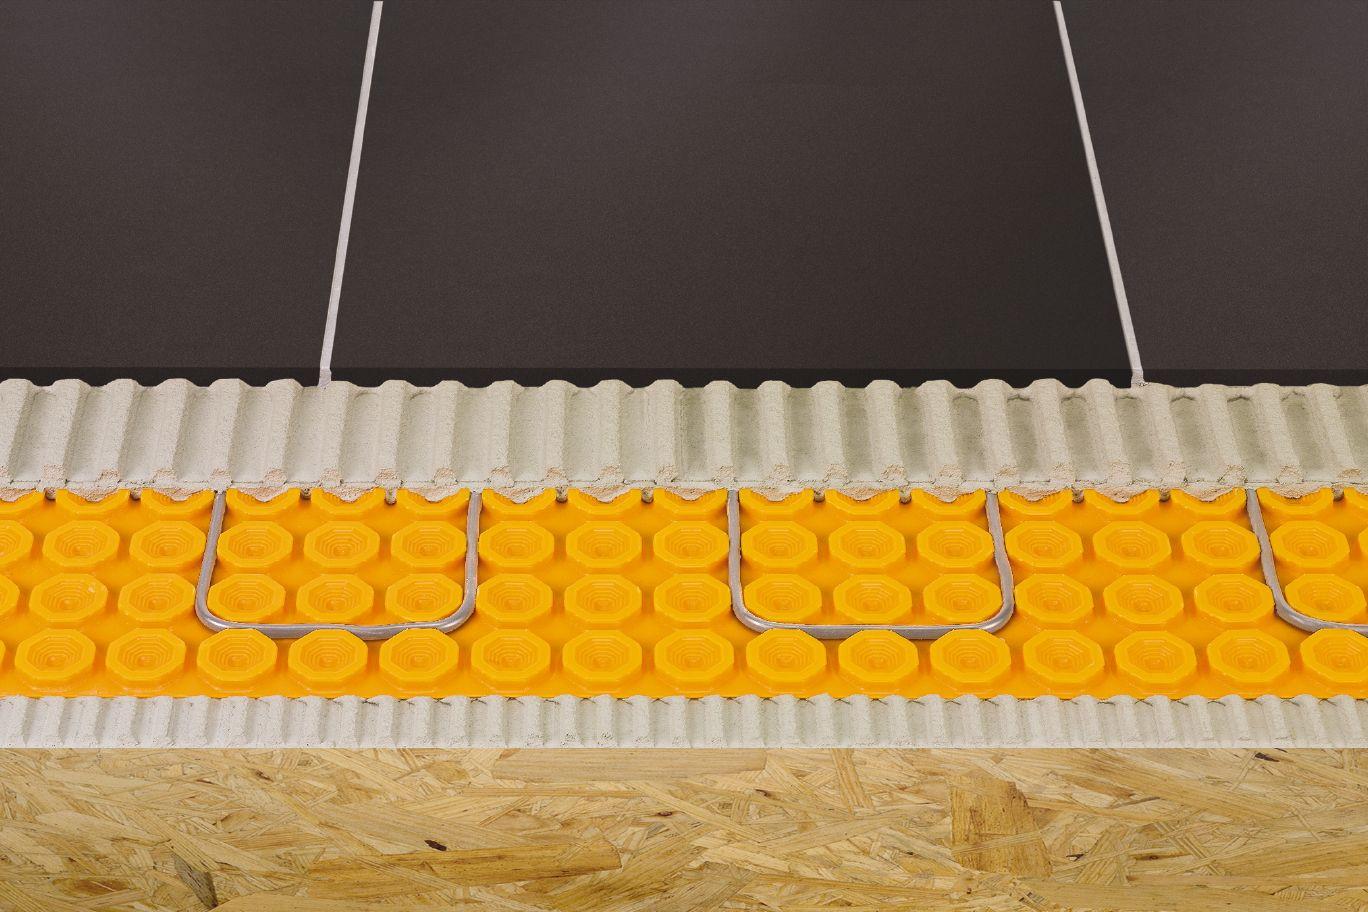 hardwood floor installation kit of schlutera ditra heat floor warming schluter ca in schlutera ditra heat